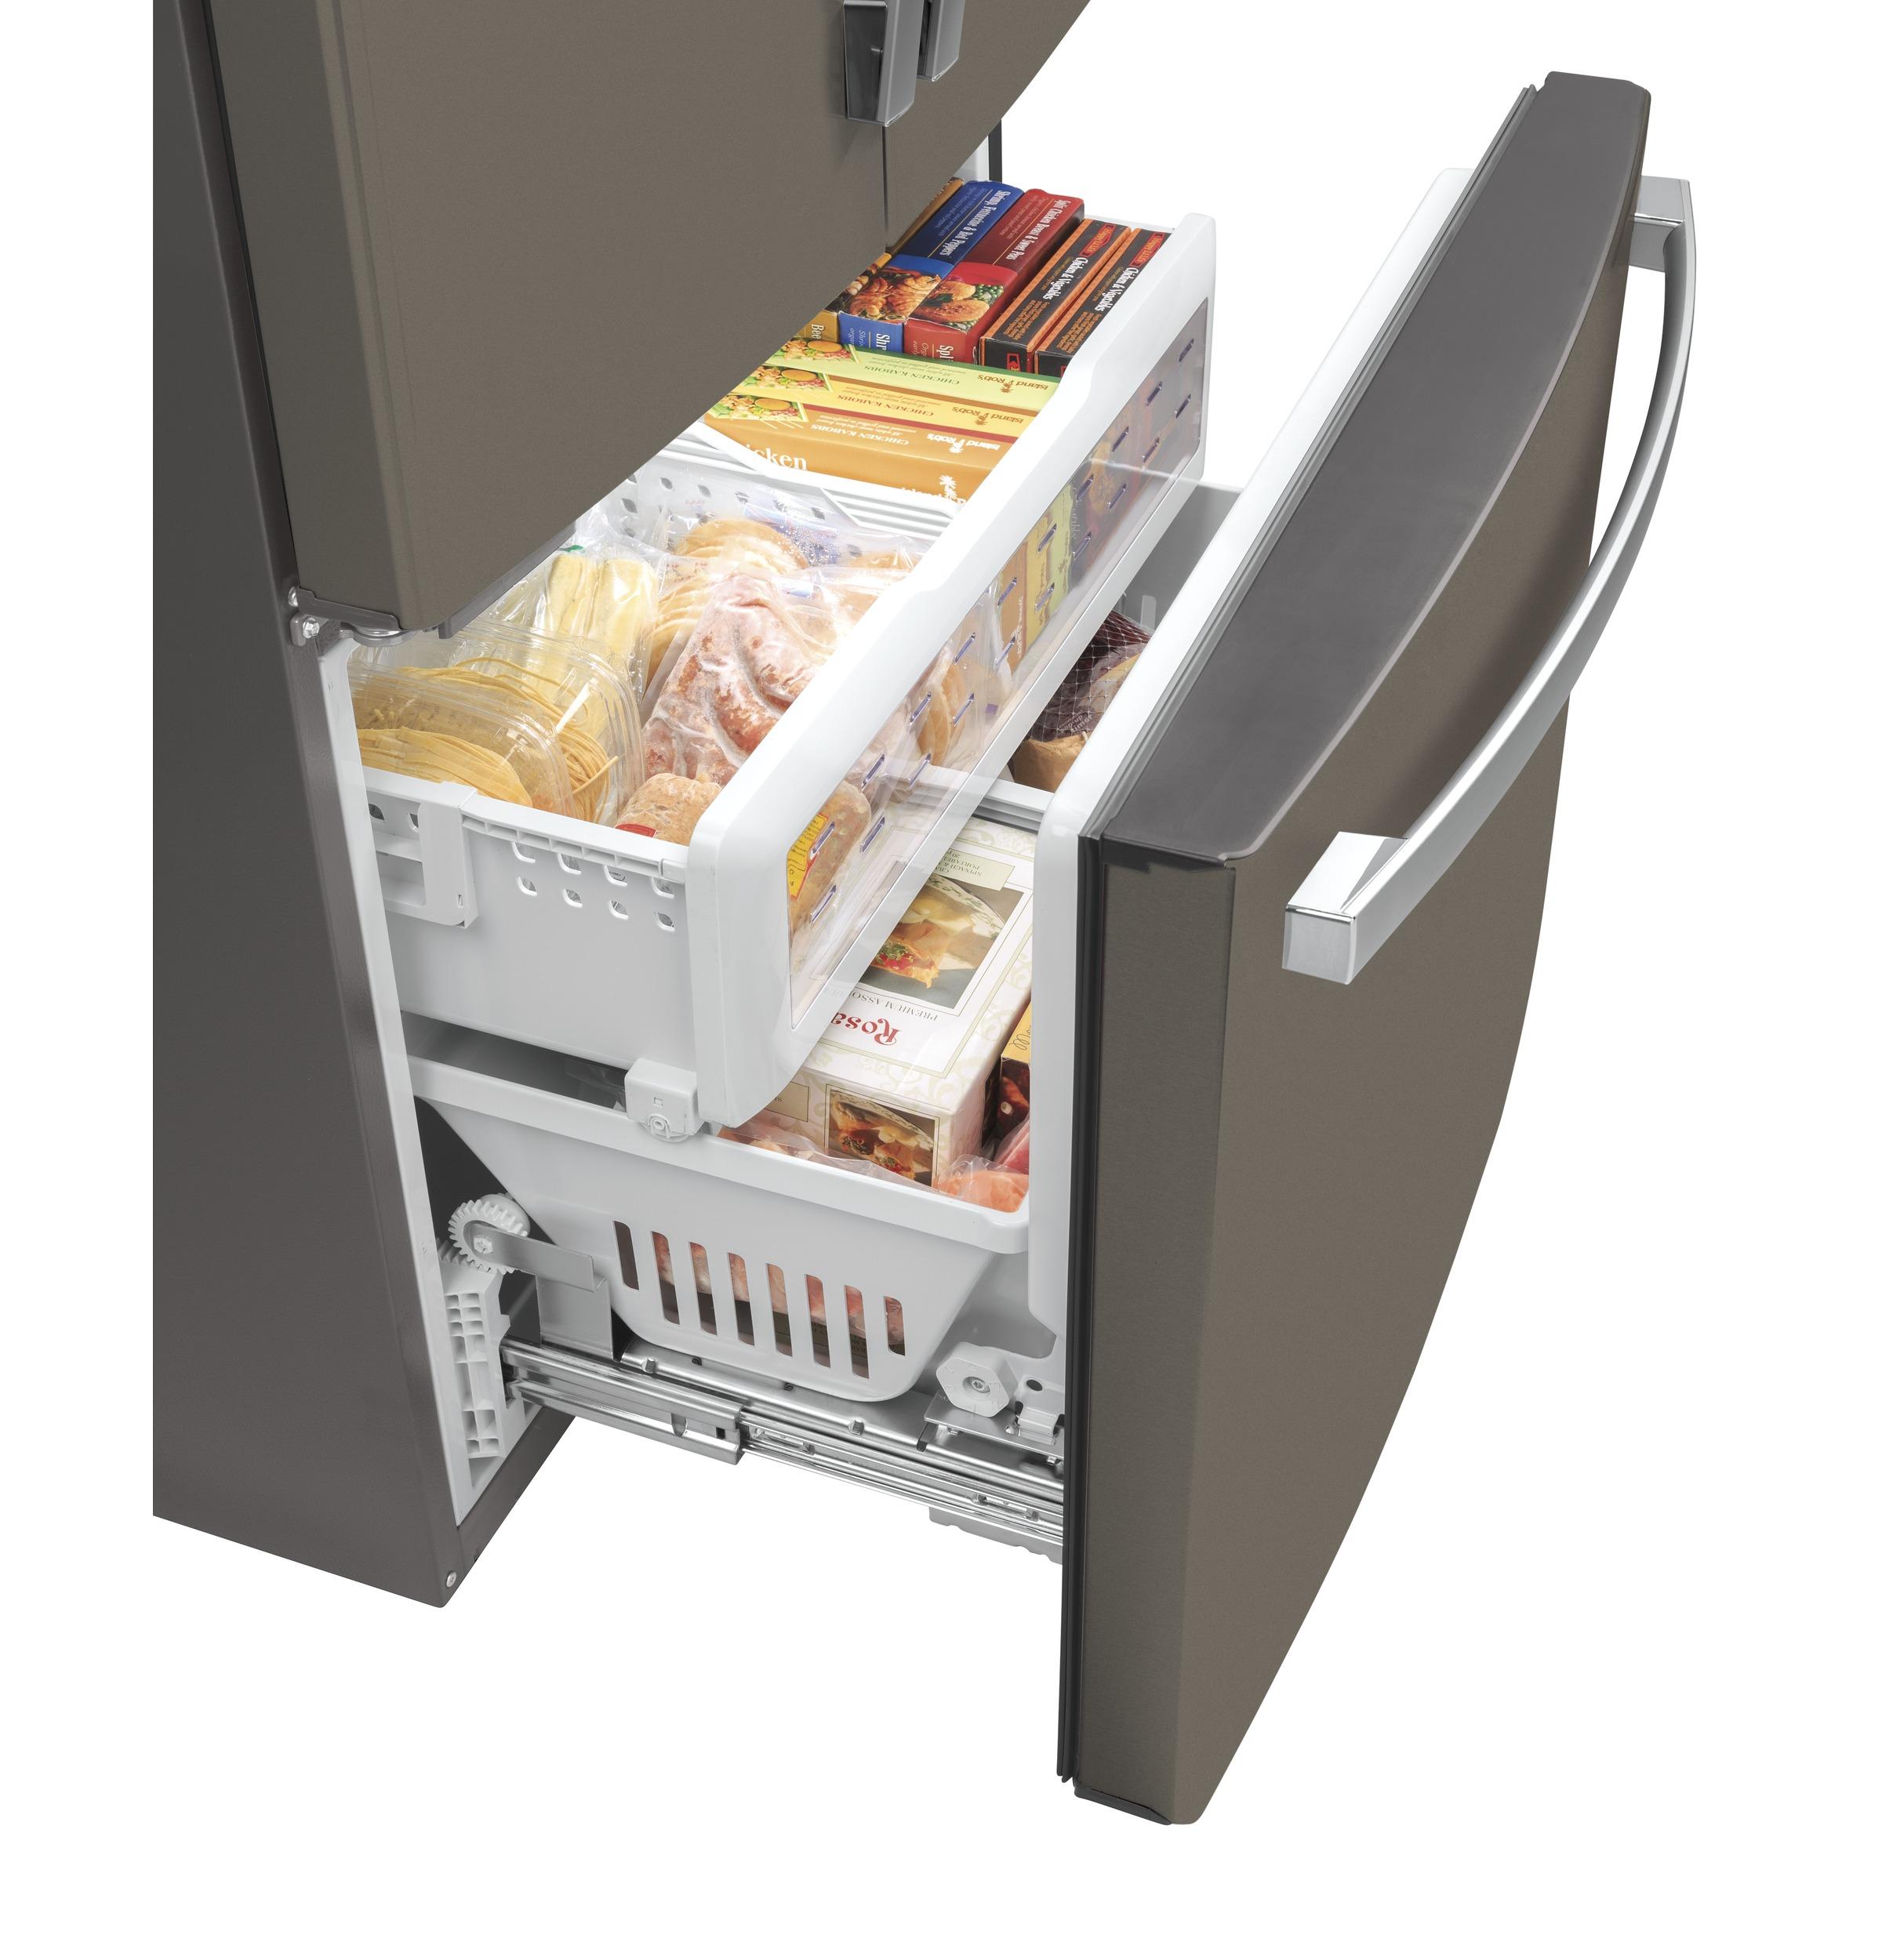 Model: GNE29GMKES   GE GE® ENERGY STAR® 28.7 Cu. Ft. French-Door Refrigerator